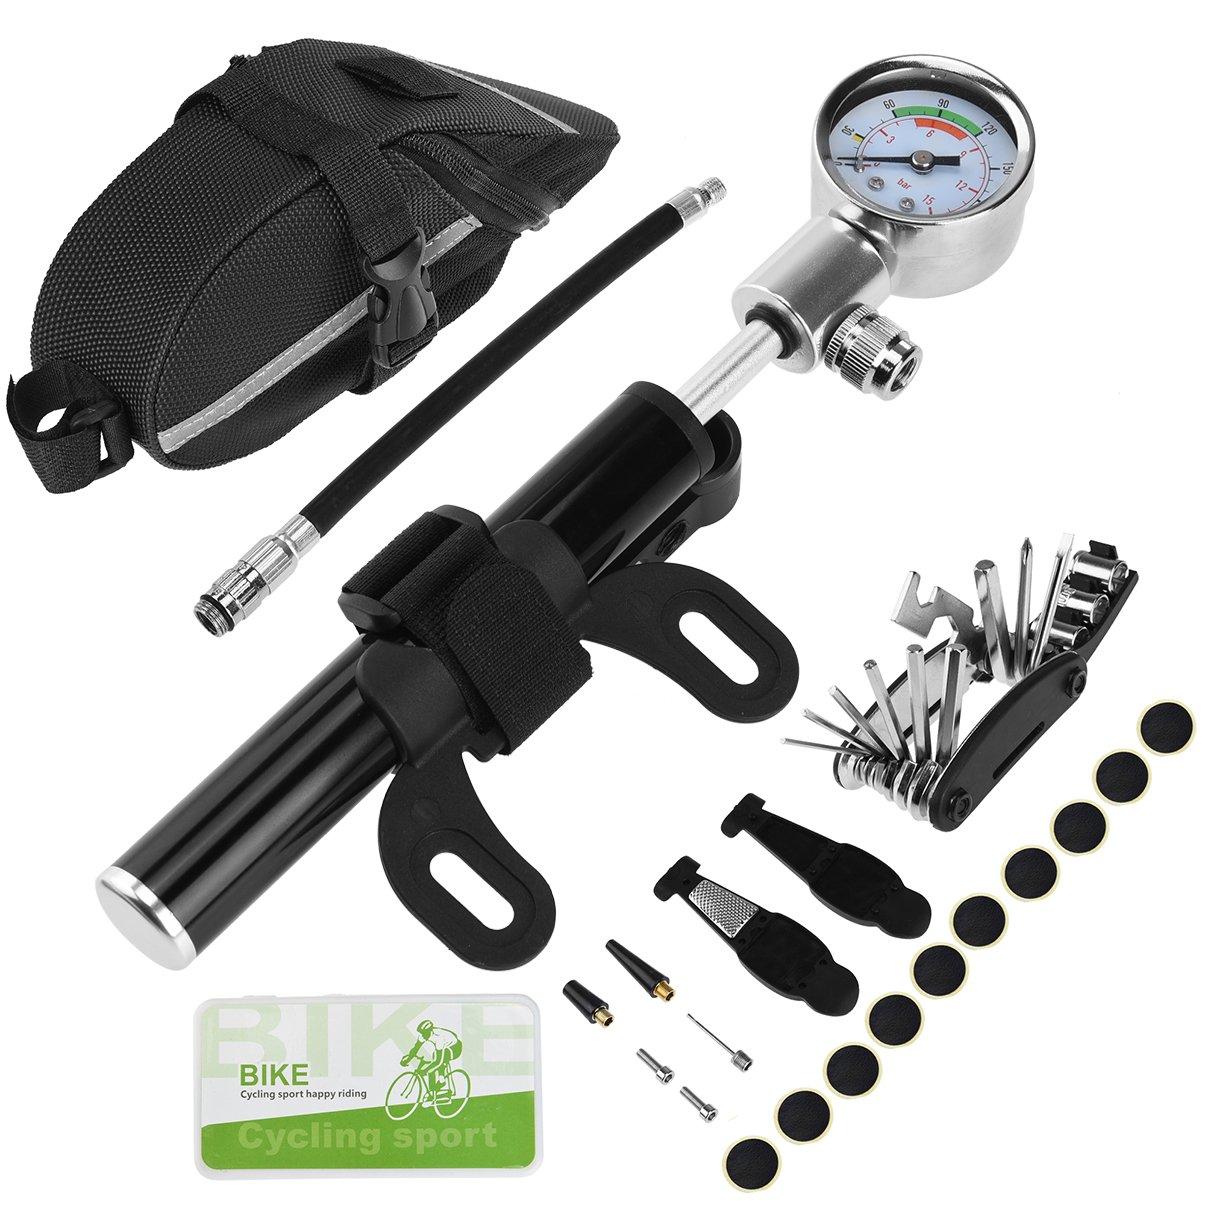 RUNACC Bike Repair Tools Kit Portable 16-in-1 Bicycle Multi-tool Set with Nylon Bike Saddle Bag, 140 PSI Mini Bike Pump with Air Pressure Gauge, Fits Both Presta and Schrader Valves